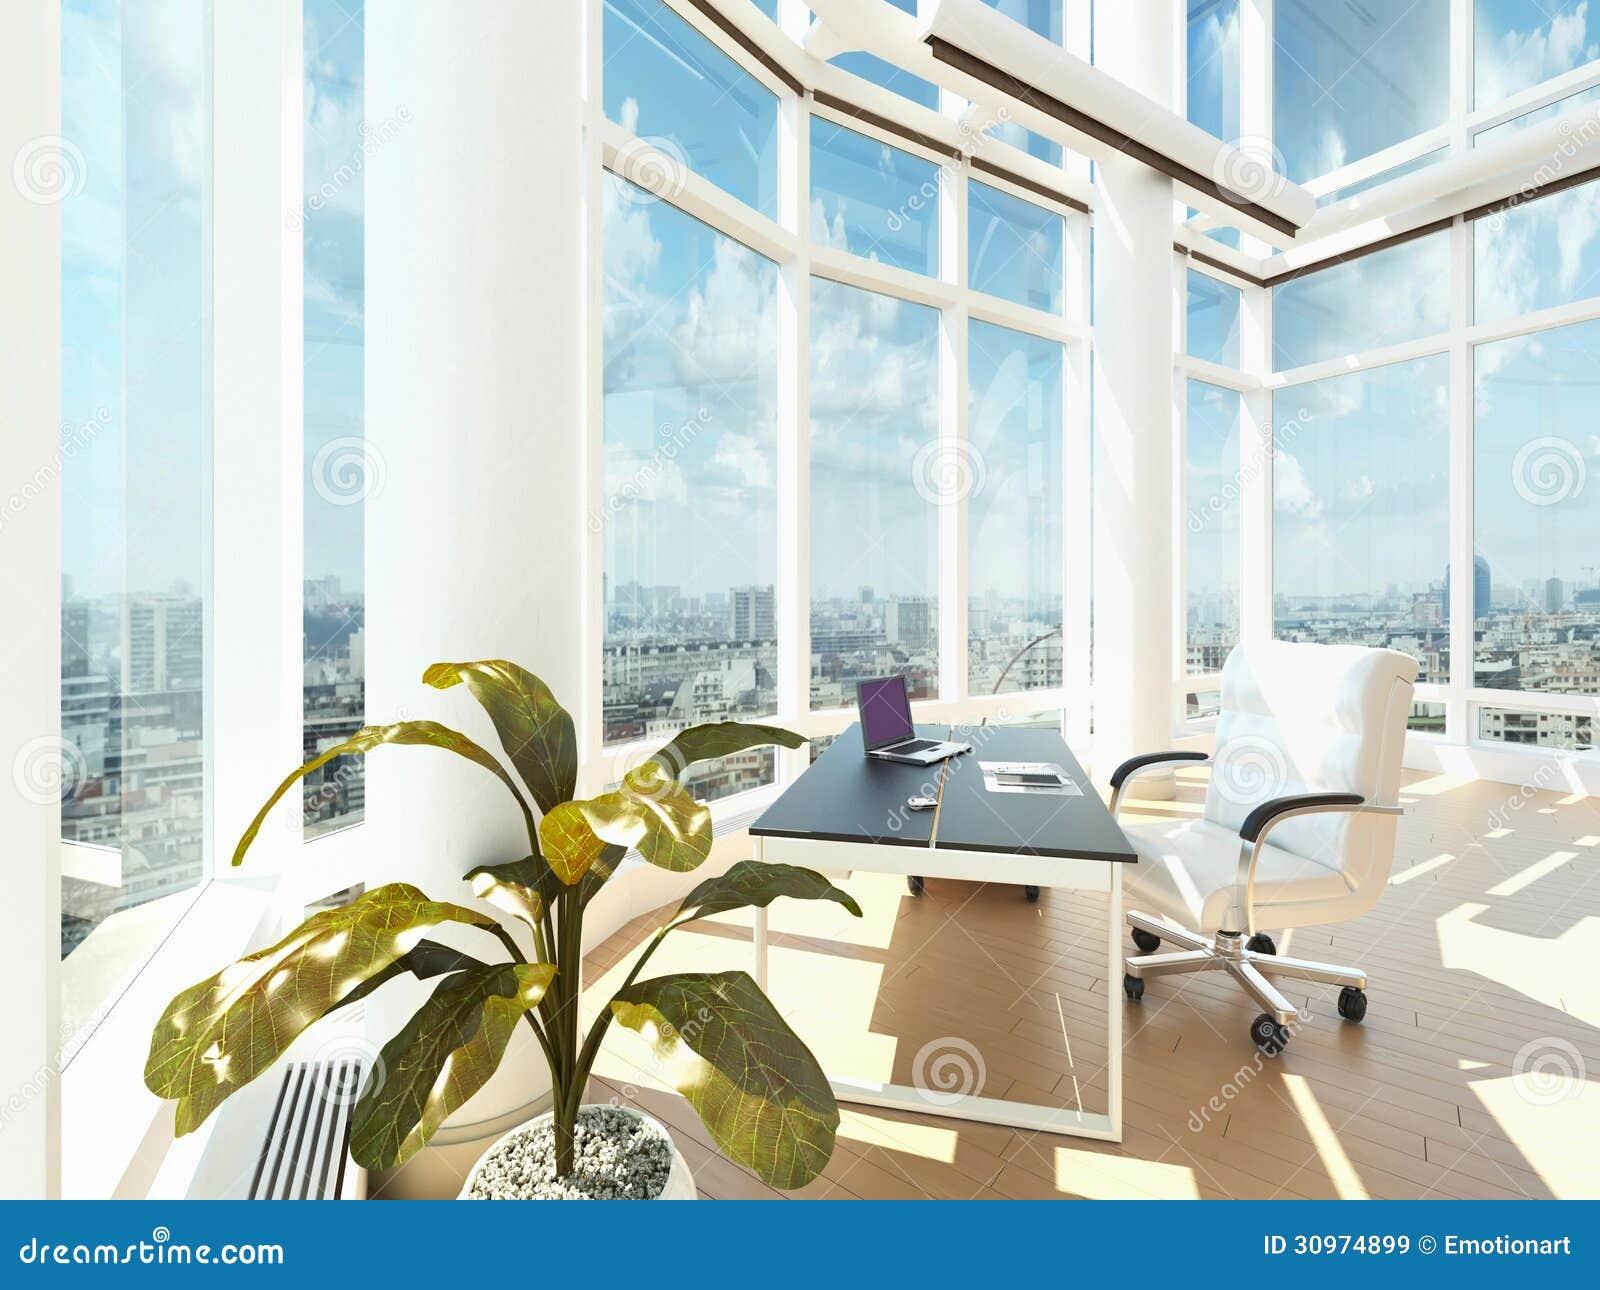 modern interior office stock. architecture interior modern office stock r